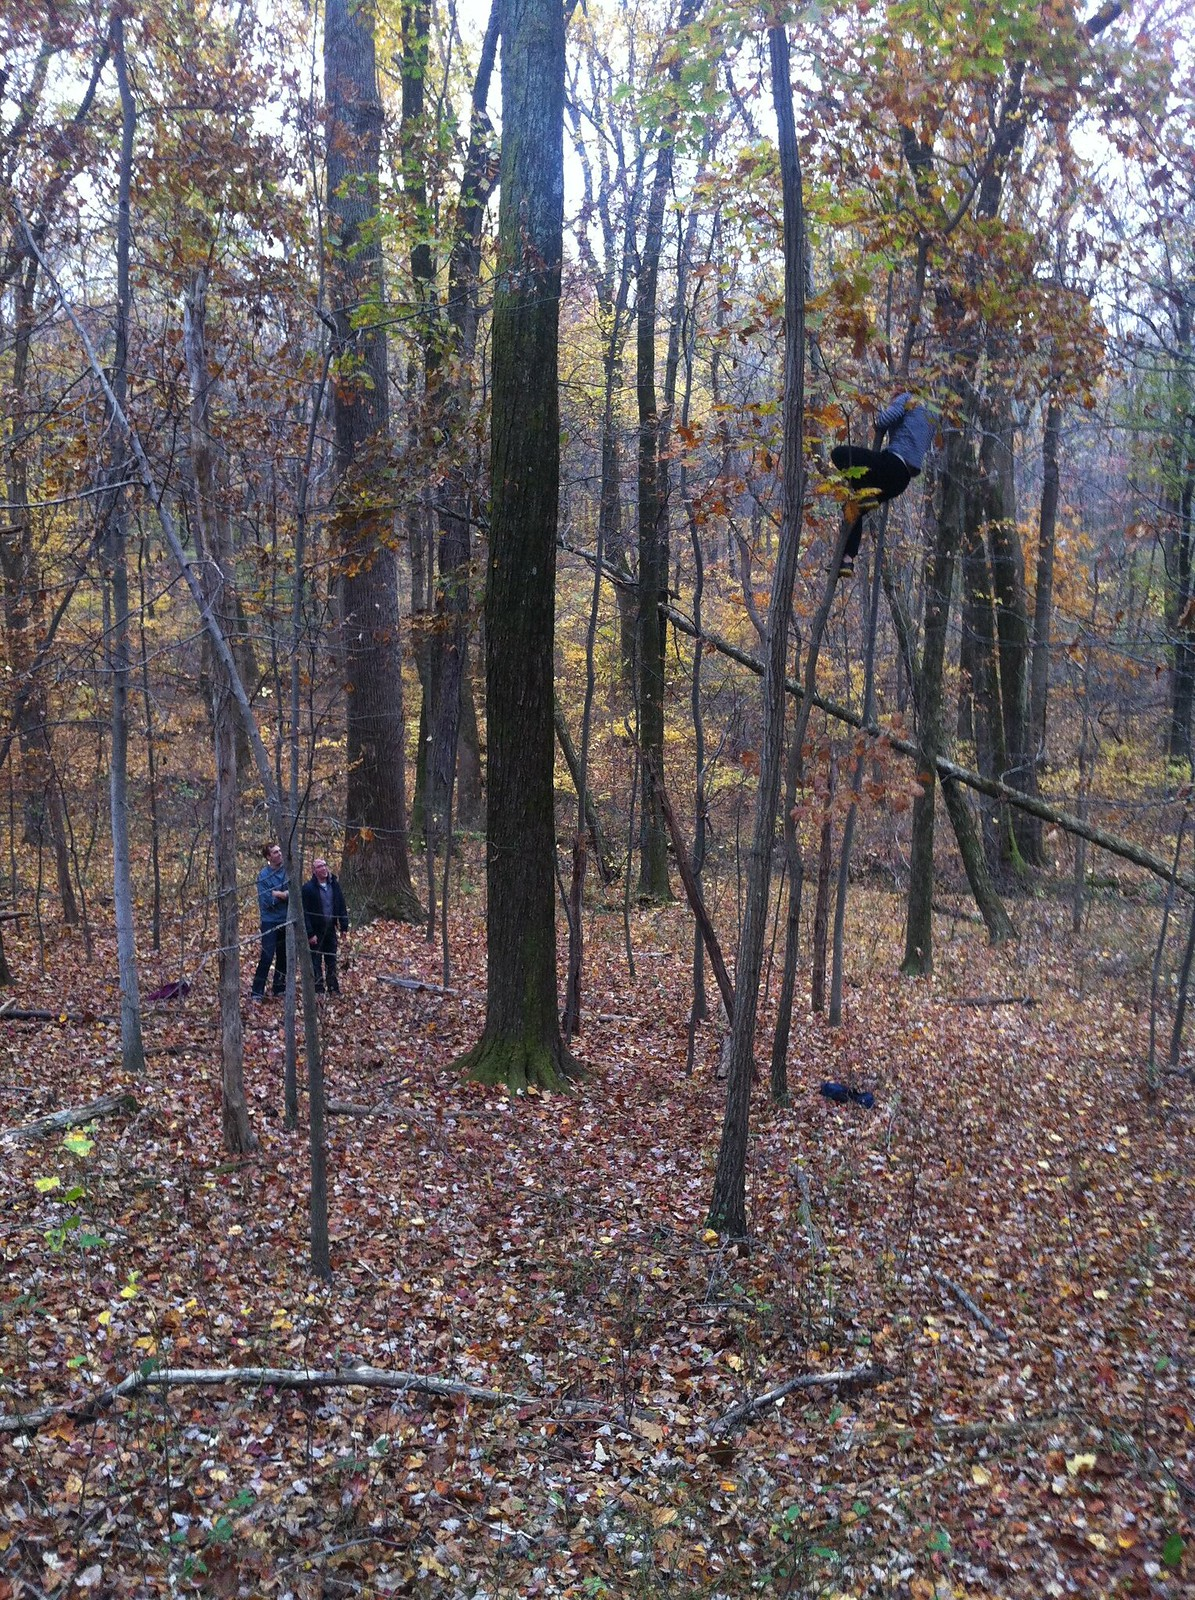 Kevin tree-riding